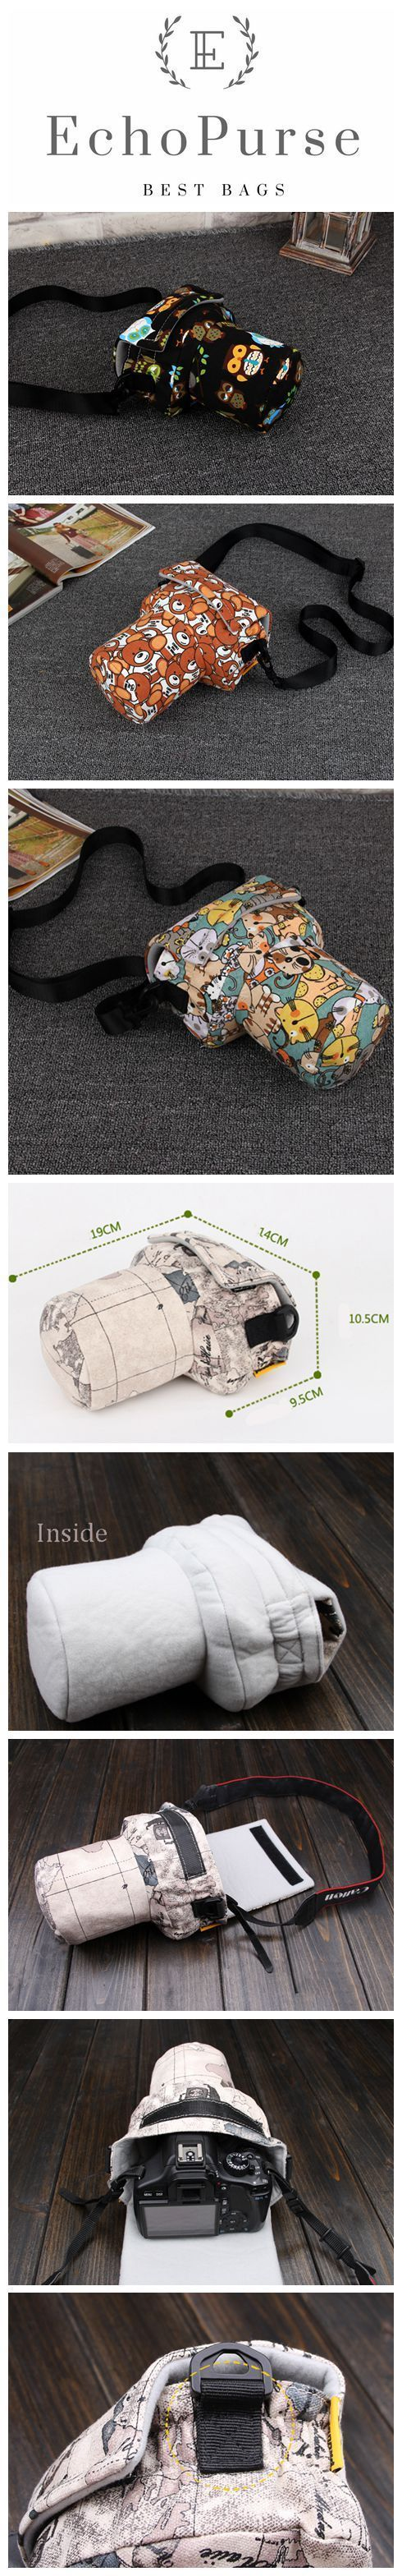 Handmade Cute SLR Camera Bag, Fashion Photography Bag, Carrying Case For EOS Nikon Pentax Olympus A113-1